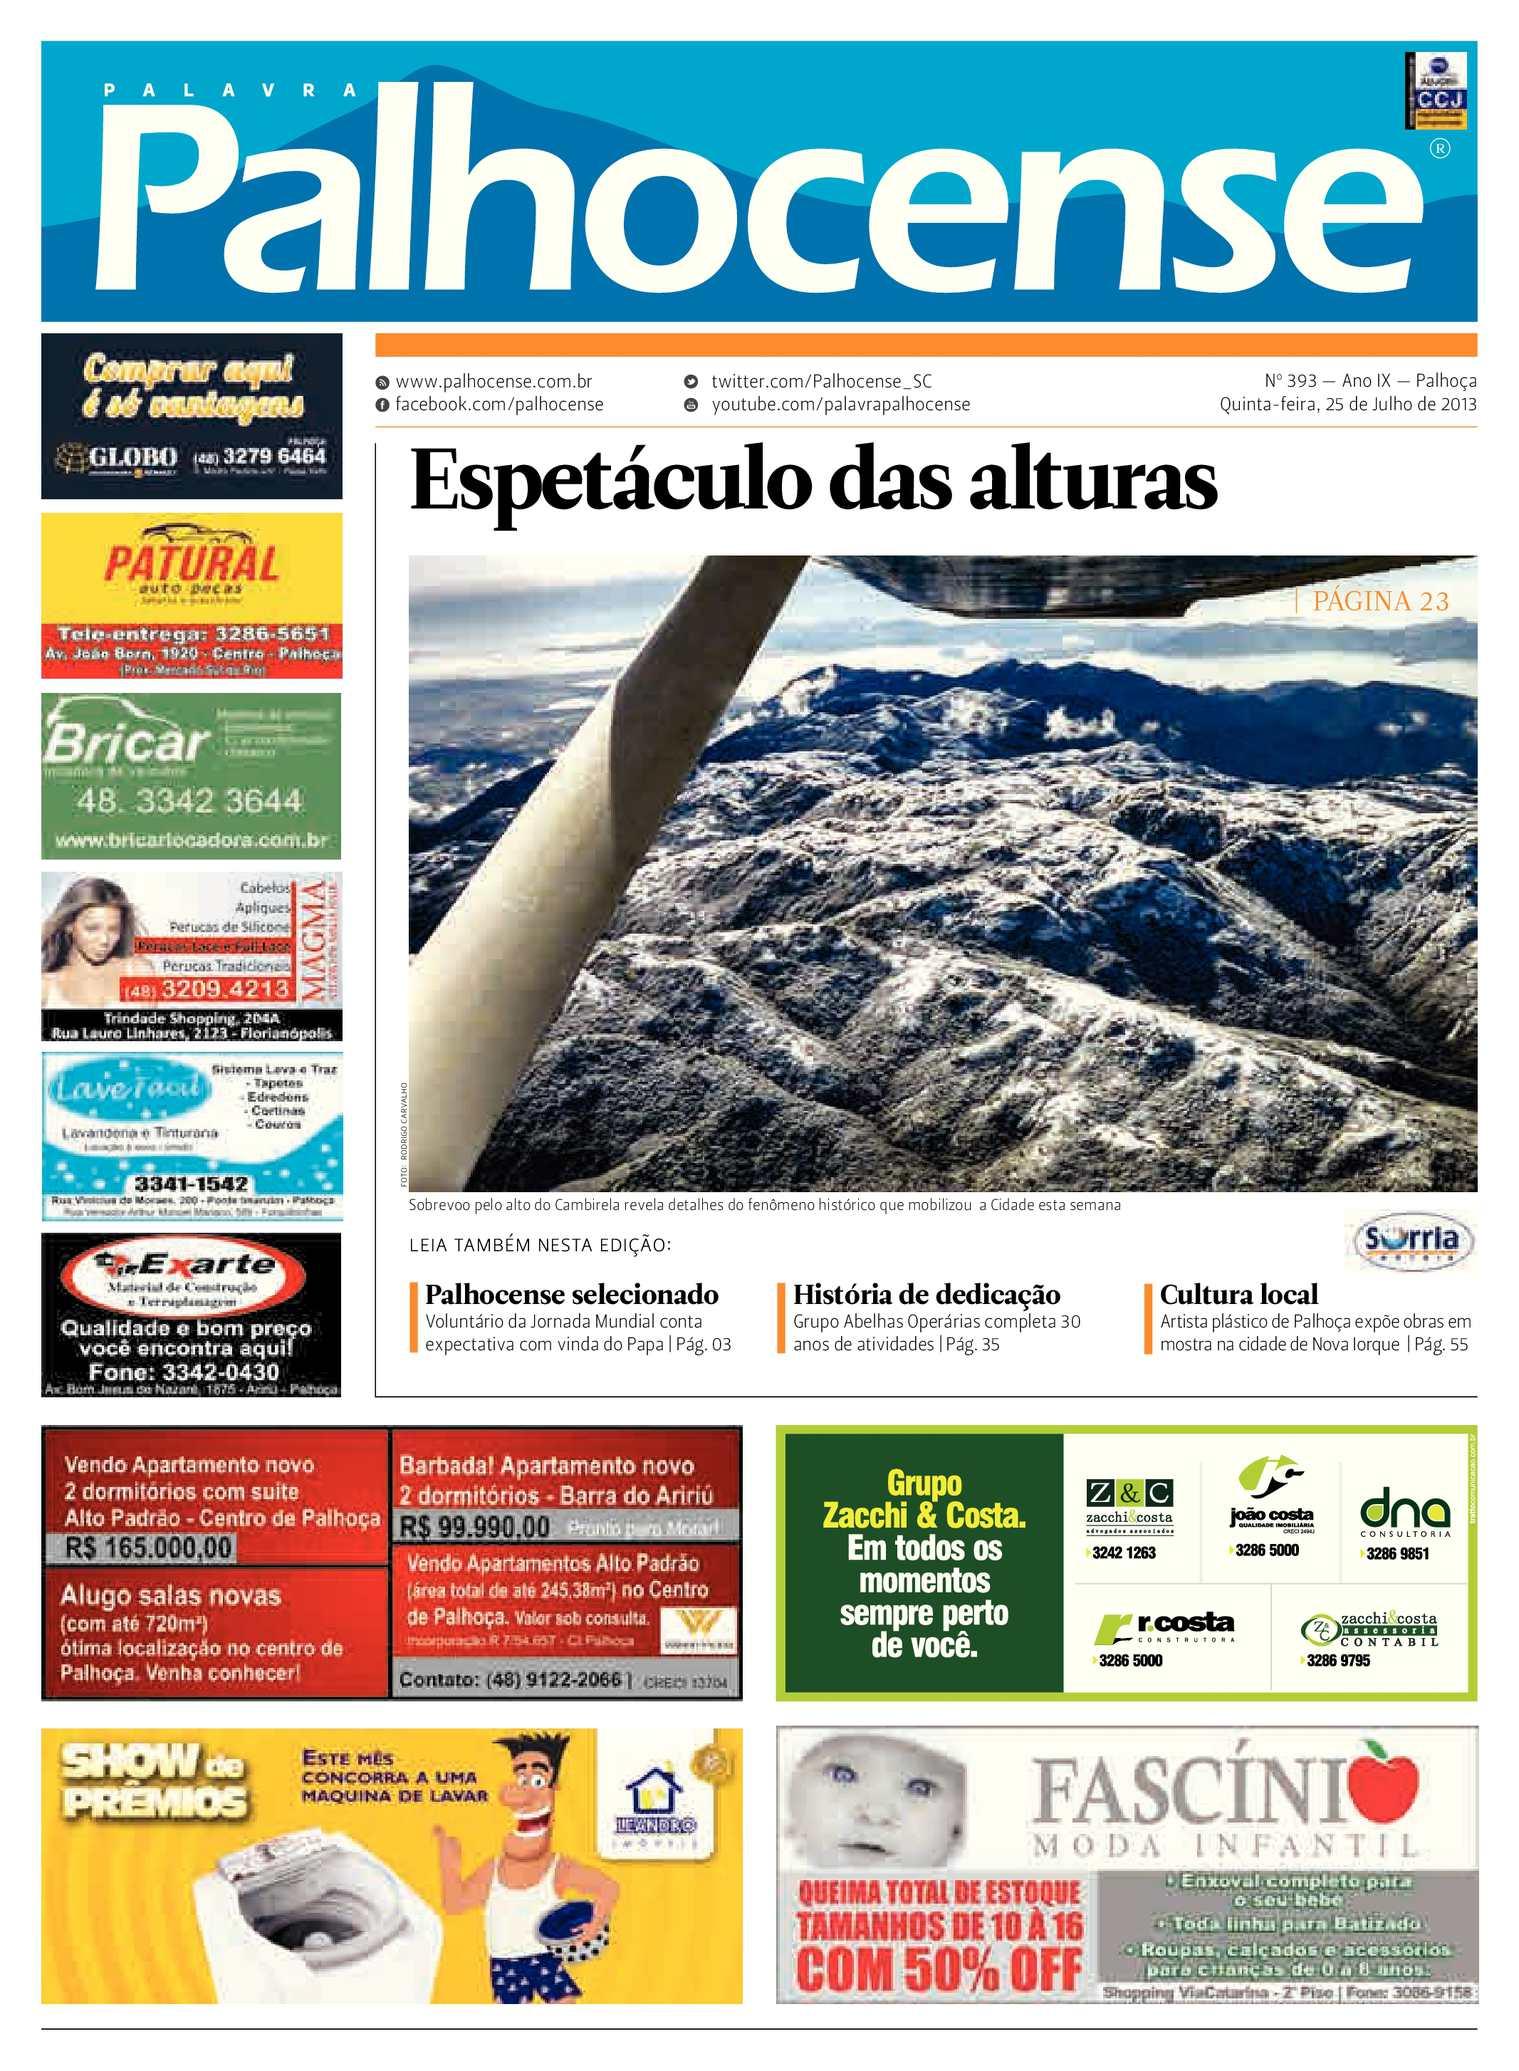 Calaméo - Jornal Palavra Palhocense - Edição 393 78e1adeeb93